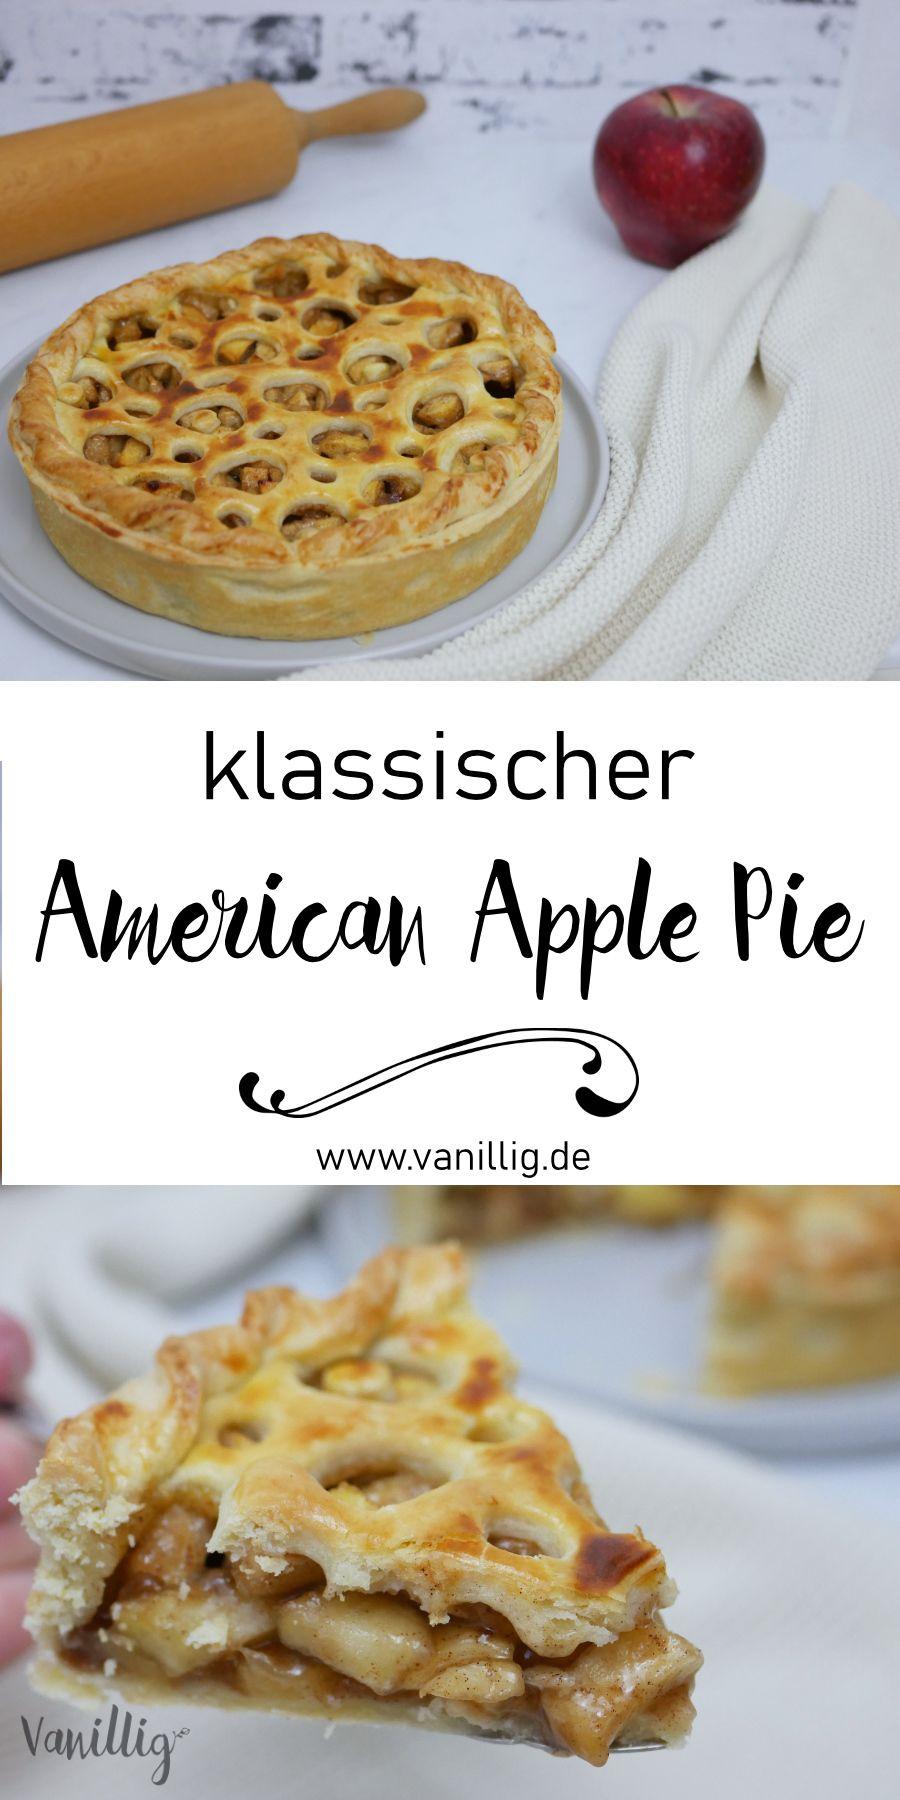 Klassicher American Apple Pie